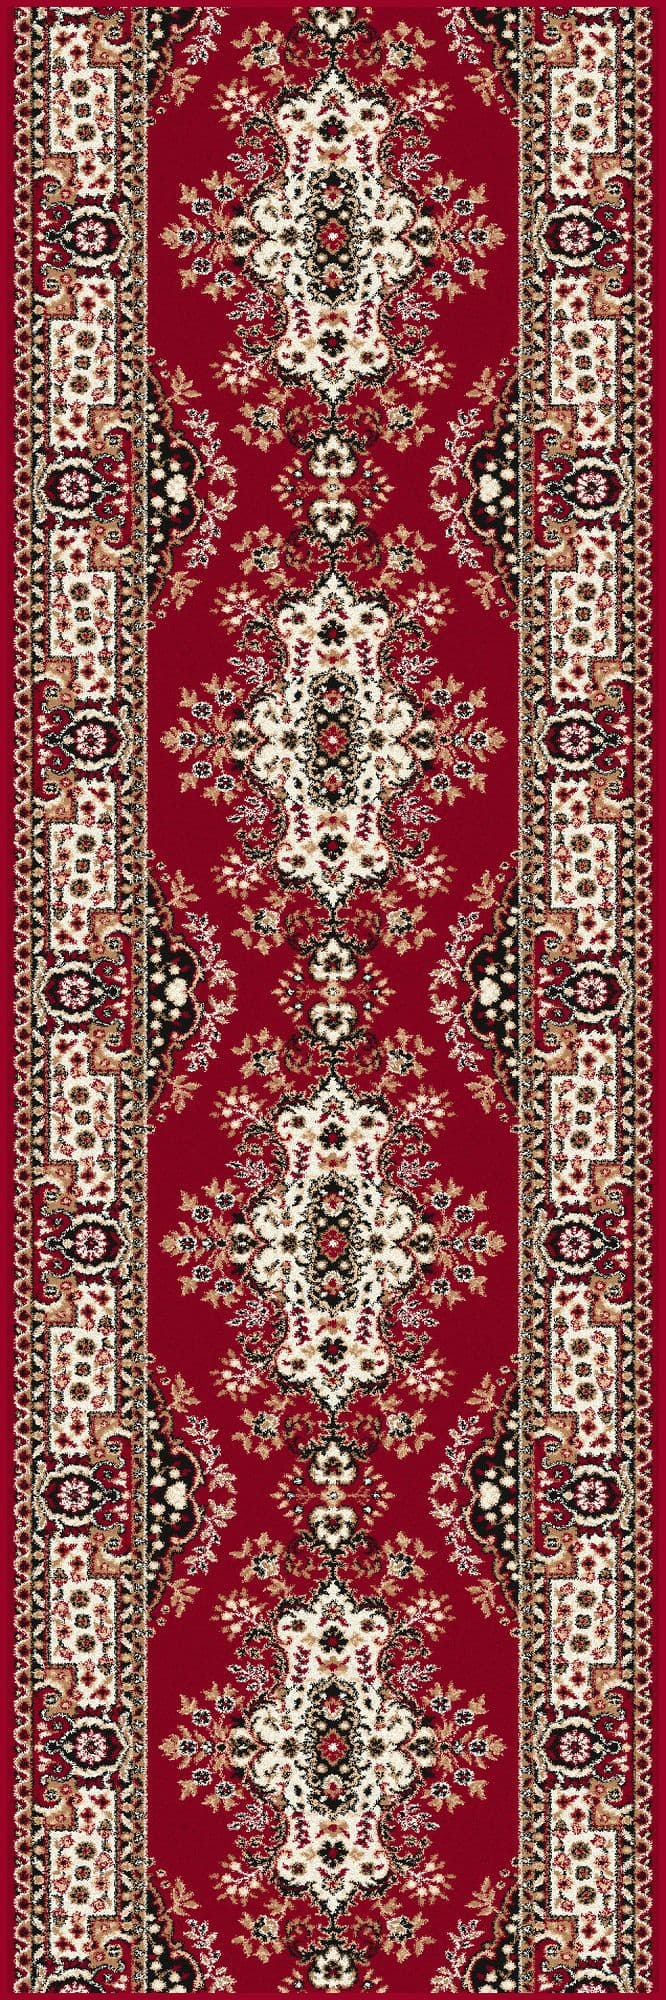 Traversa Fatima Dark Red, Wilton imagine